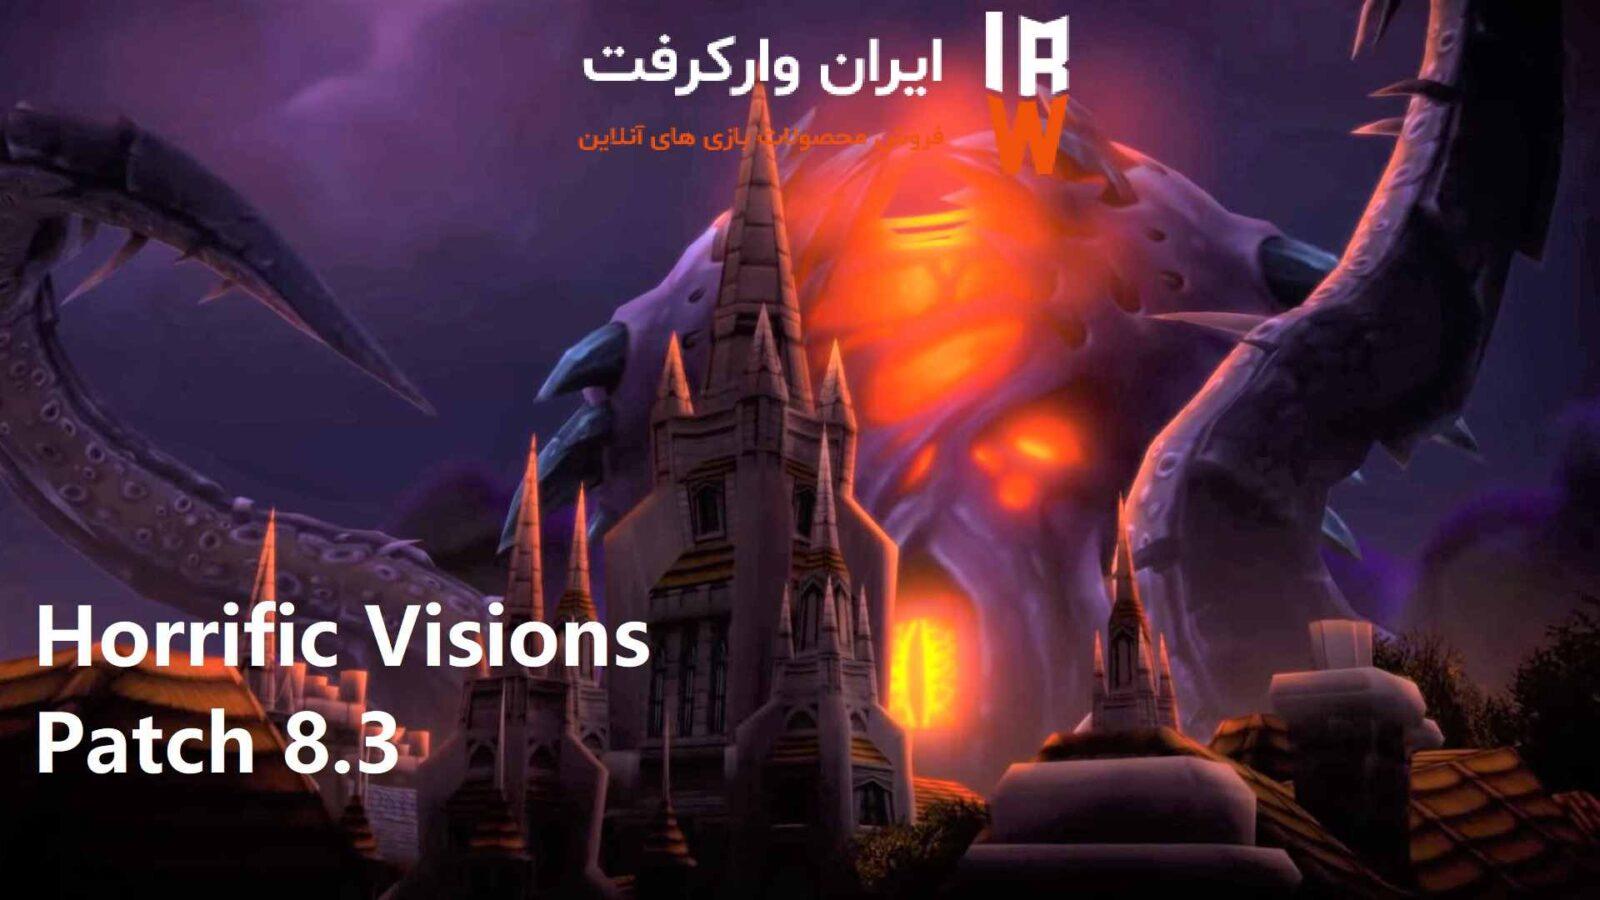 آموزش Horrific Visions در پچ ۸٫۳ بسته الحاقی Battle For Azeroth